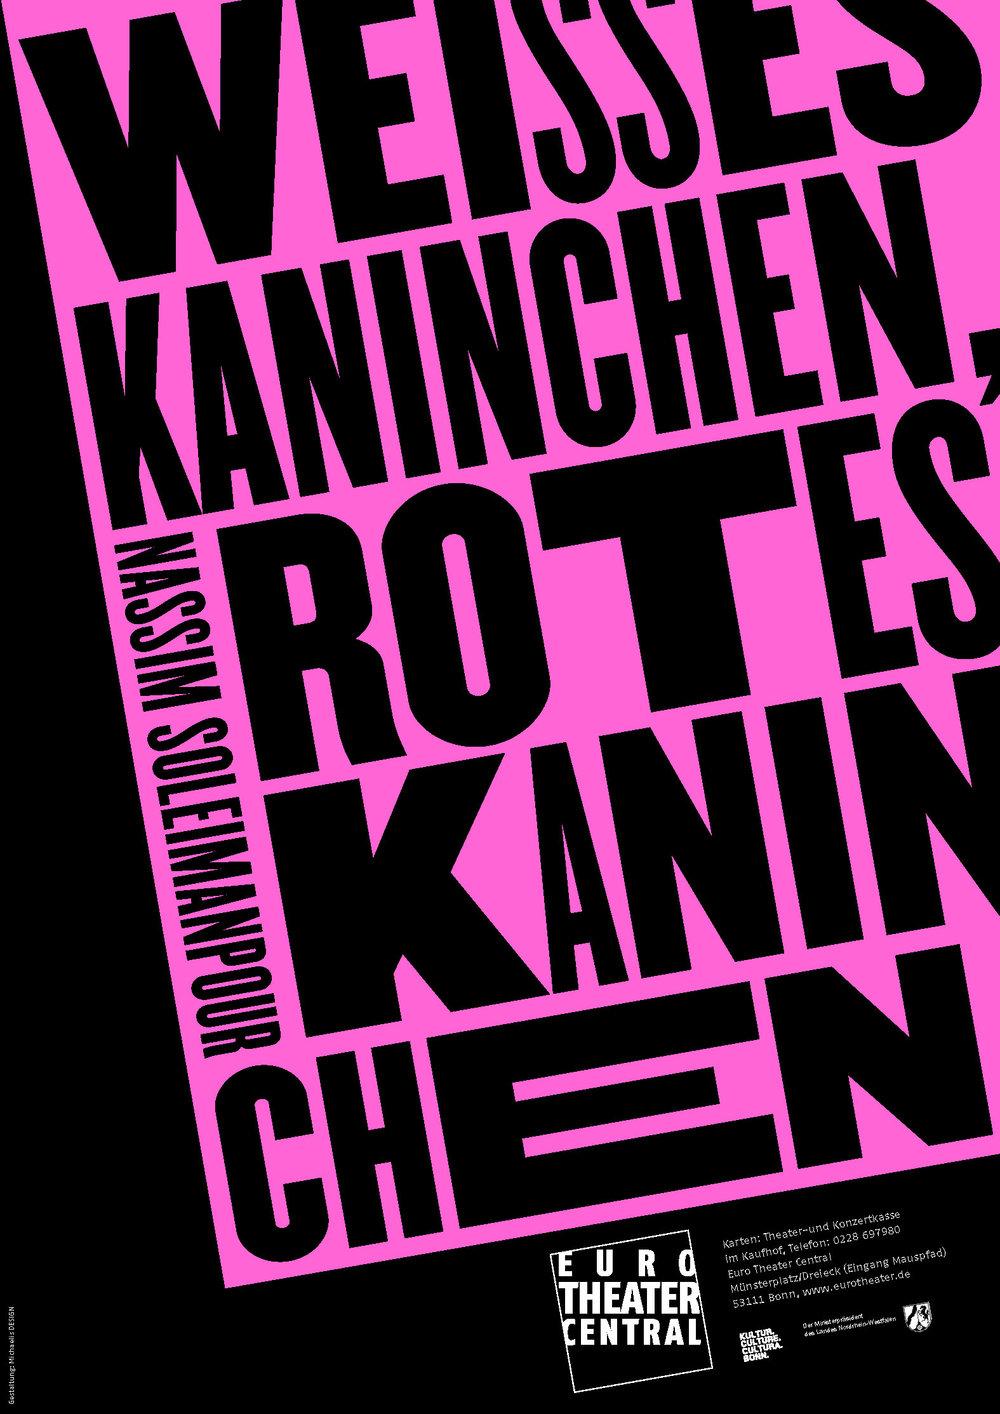 Plakat_Kaninchen2_Farbe.jpg